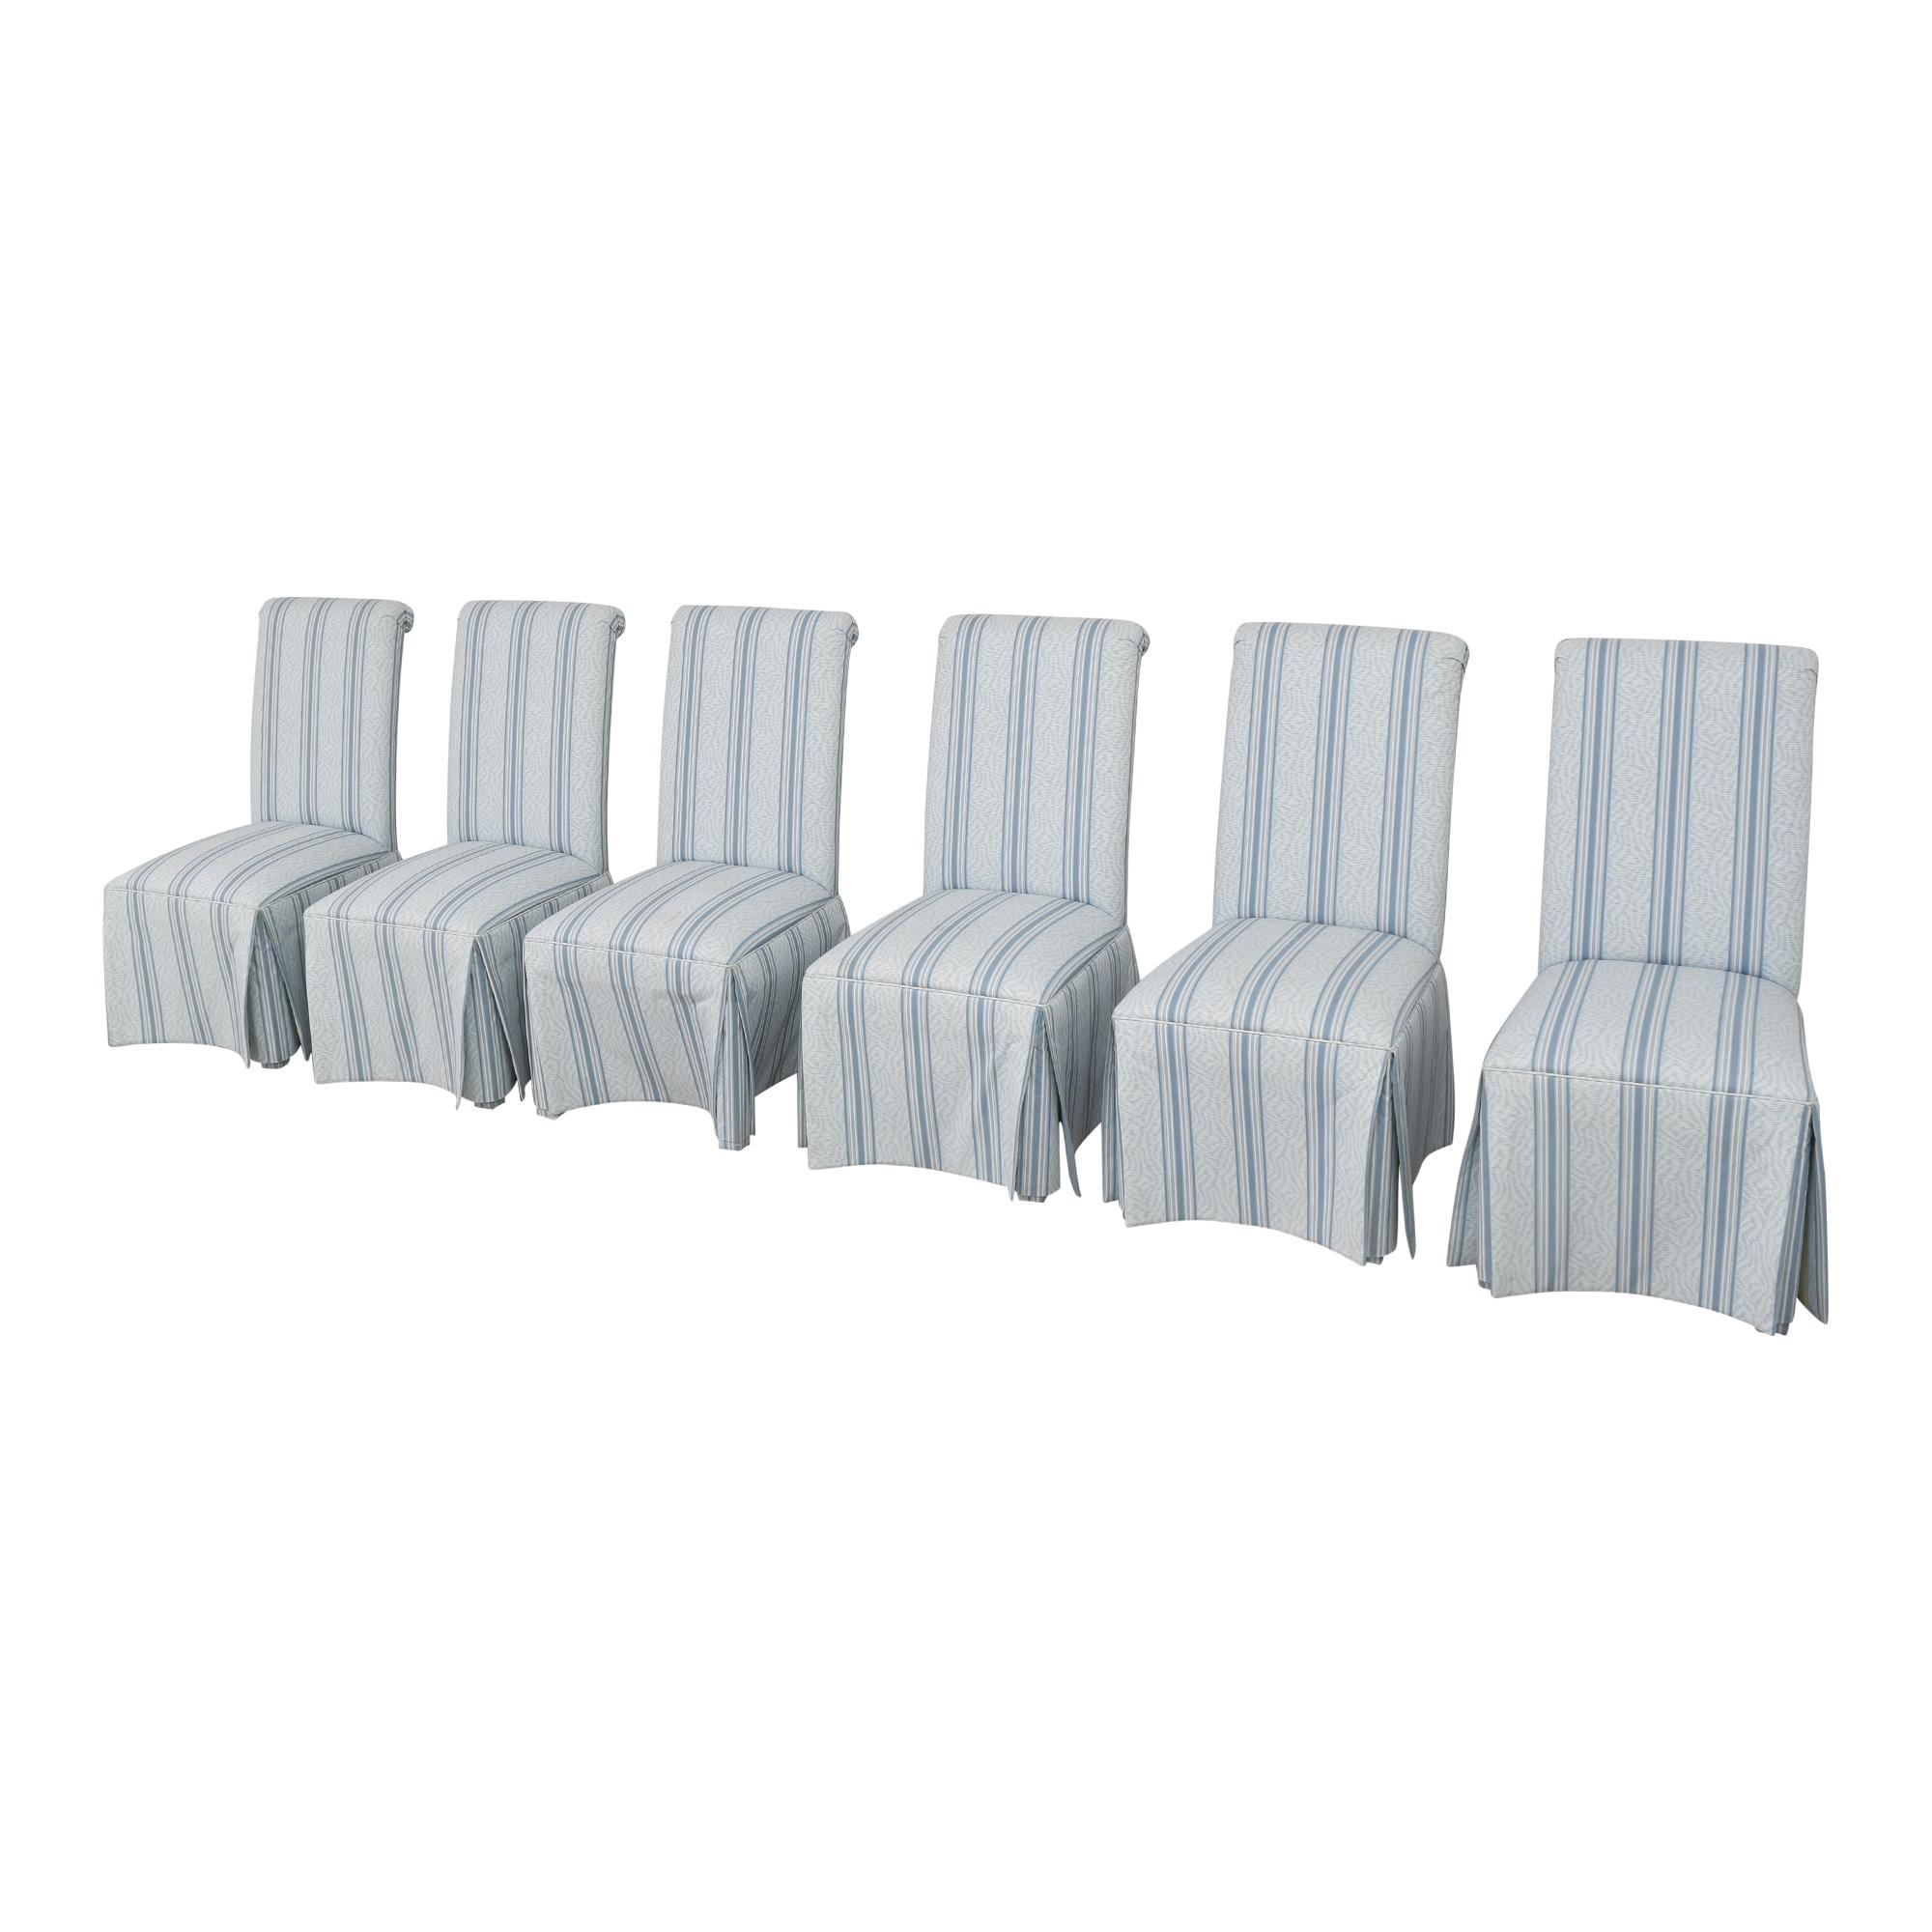 Regency Regency House Scroll Back Skirted Dining Chairs blue